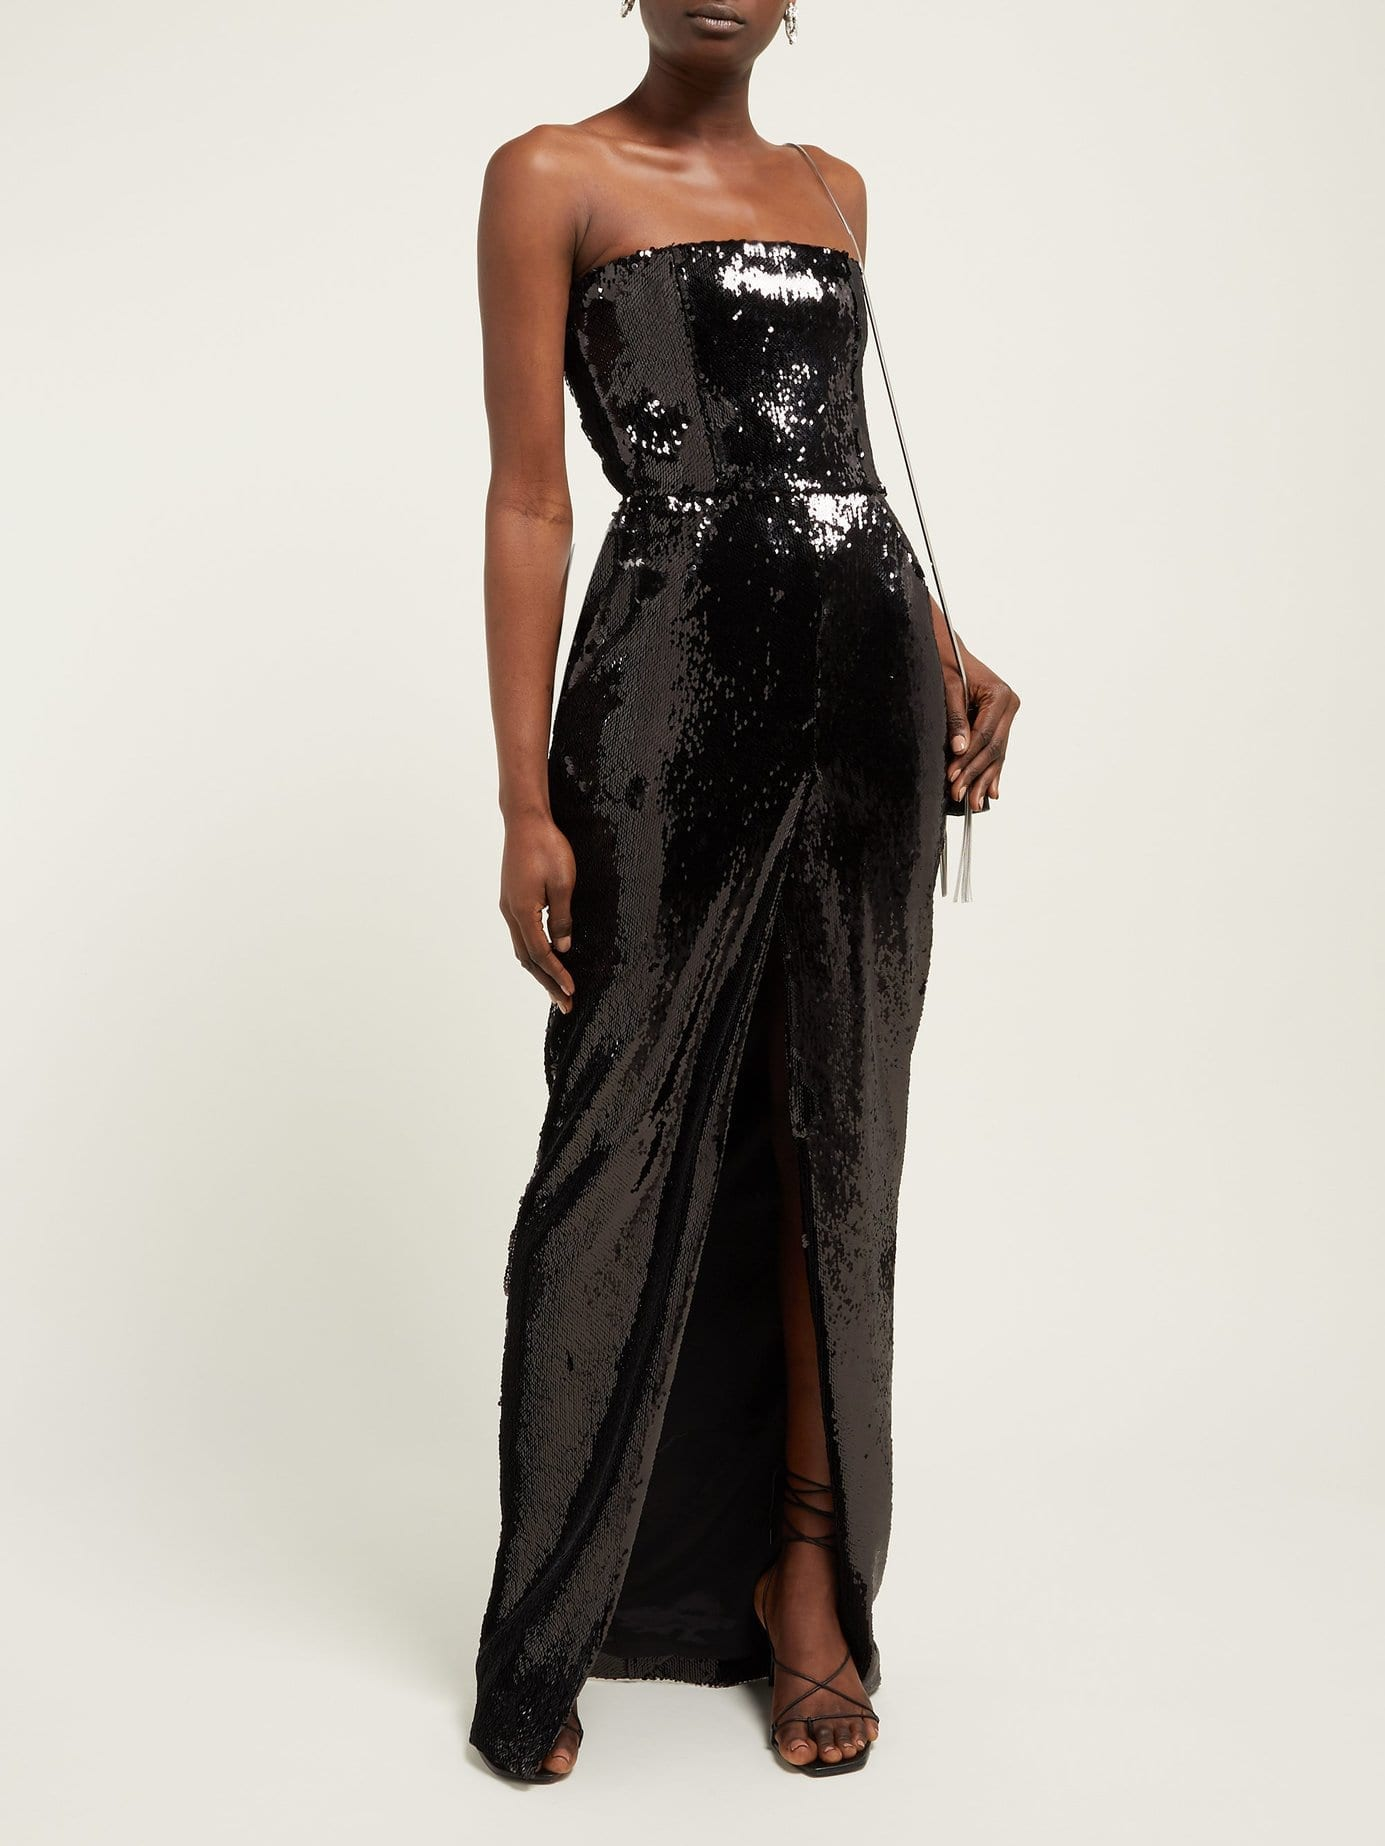 ALEXANDRE VAUTHIER Strapless Front-Slit Sequinned Black Gown